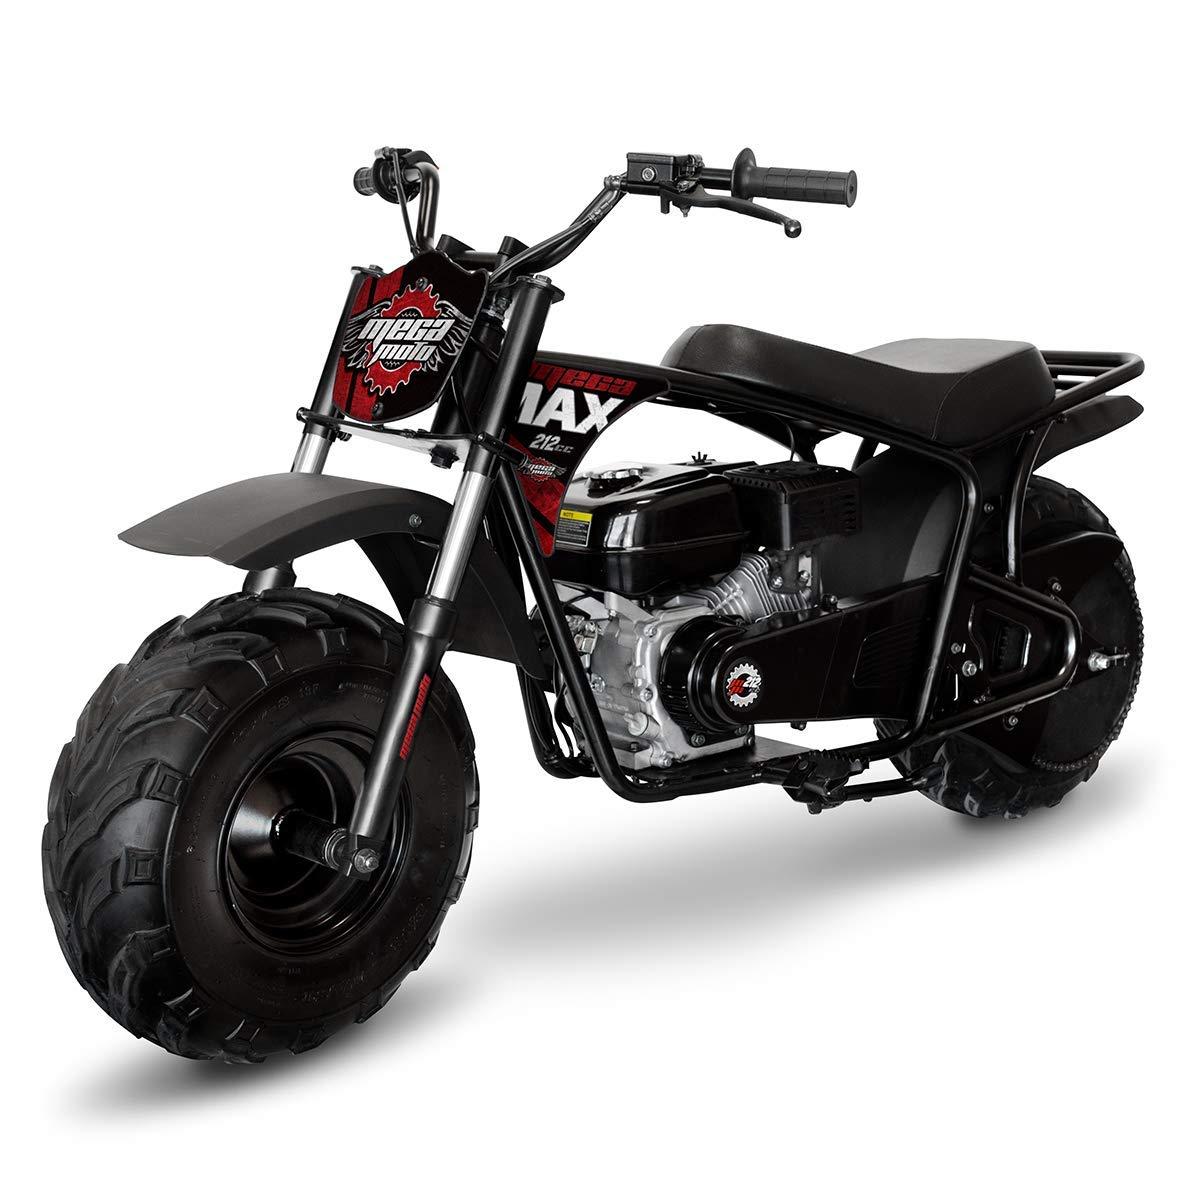 Mega Moto MM-B212-MXS (Black/Red) 212CC 7 5HP with Suspension Mini Bike